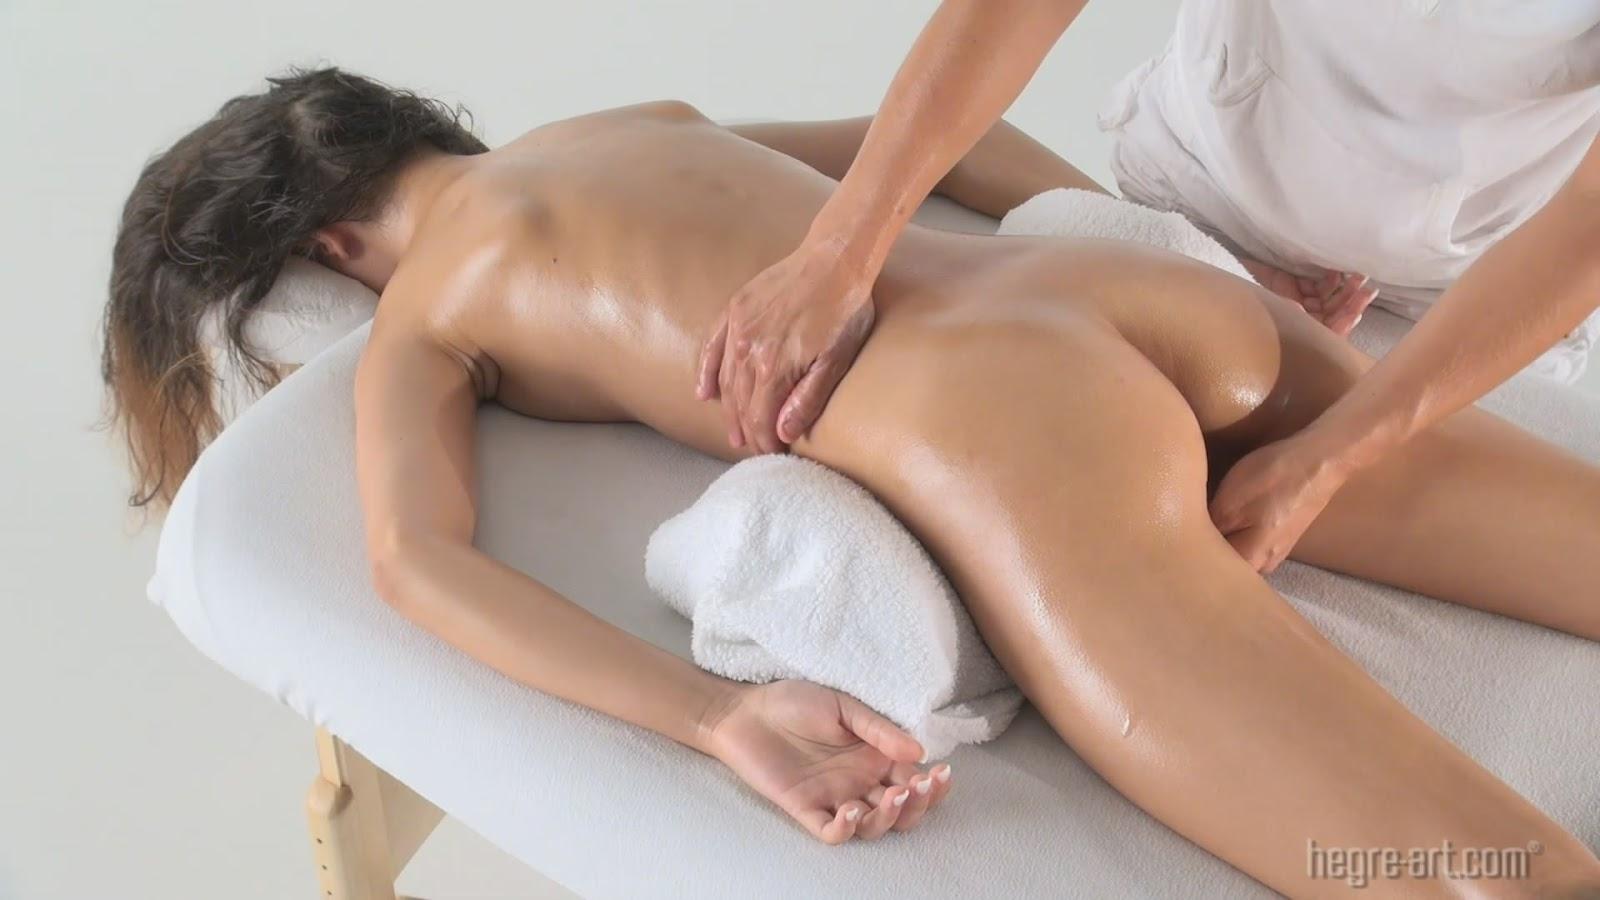 mature anal tube porn